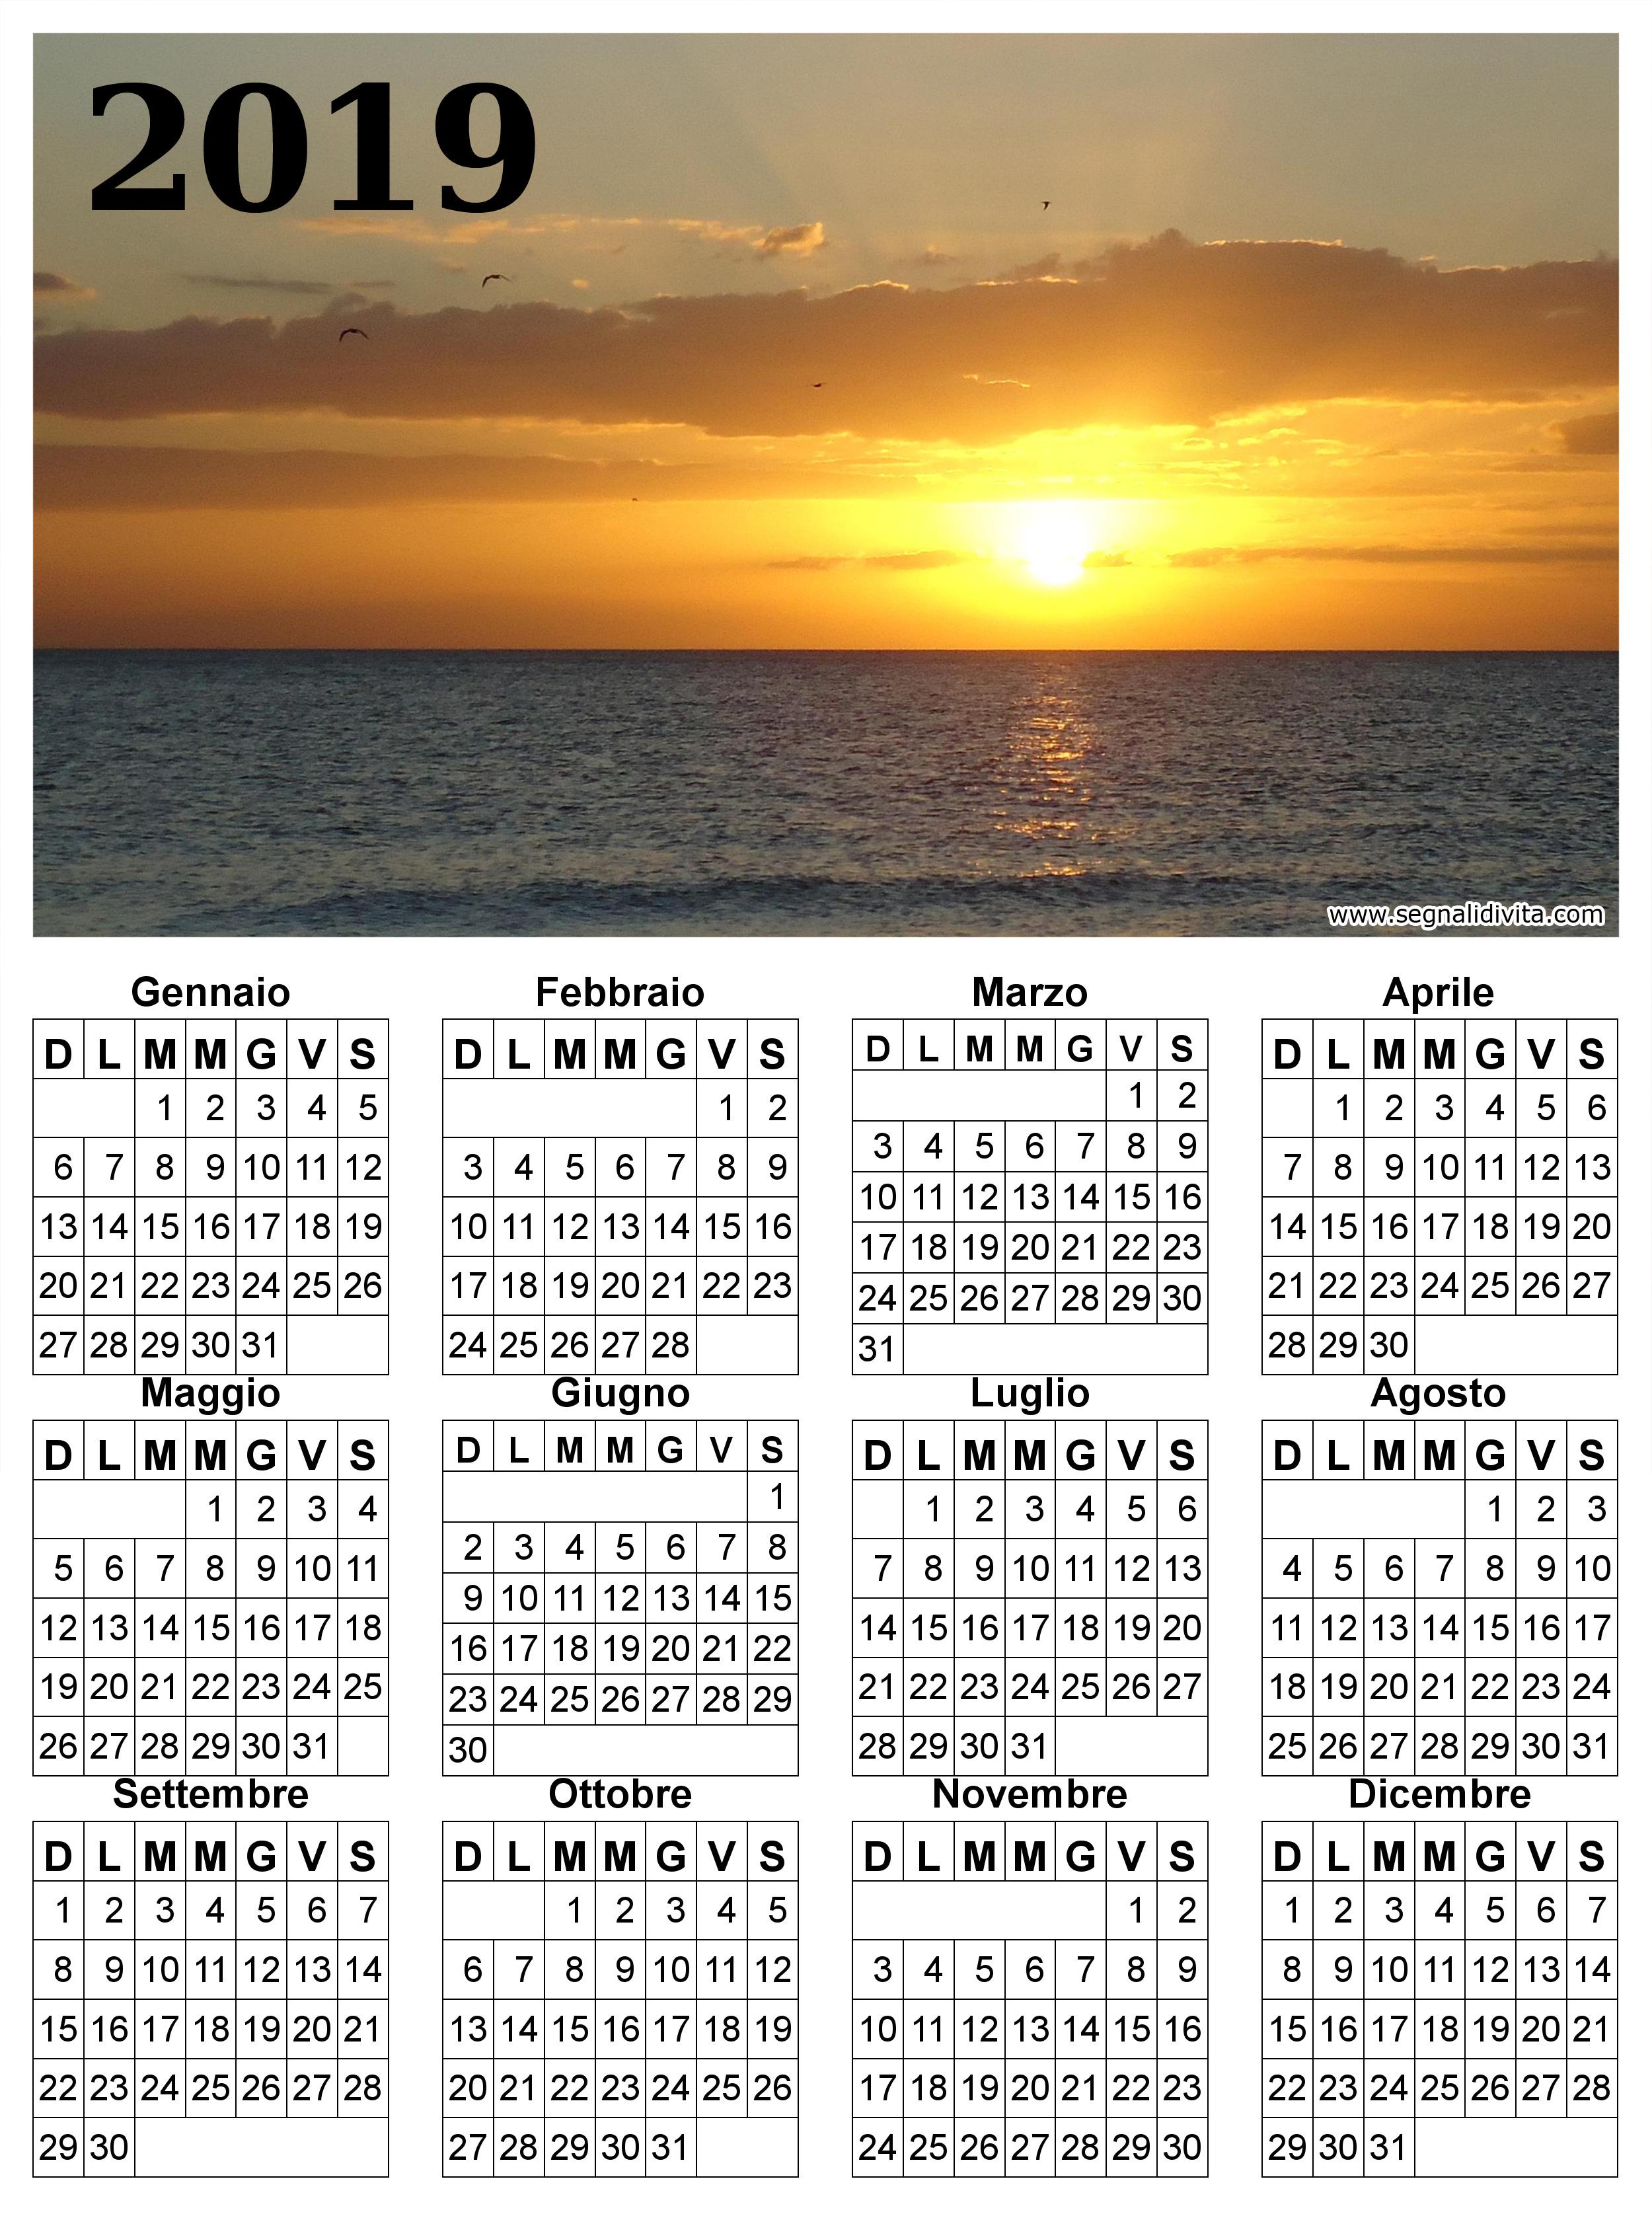 Calendario 2019 paesaggio marittimo